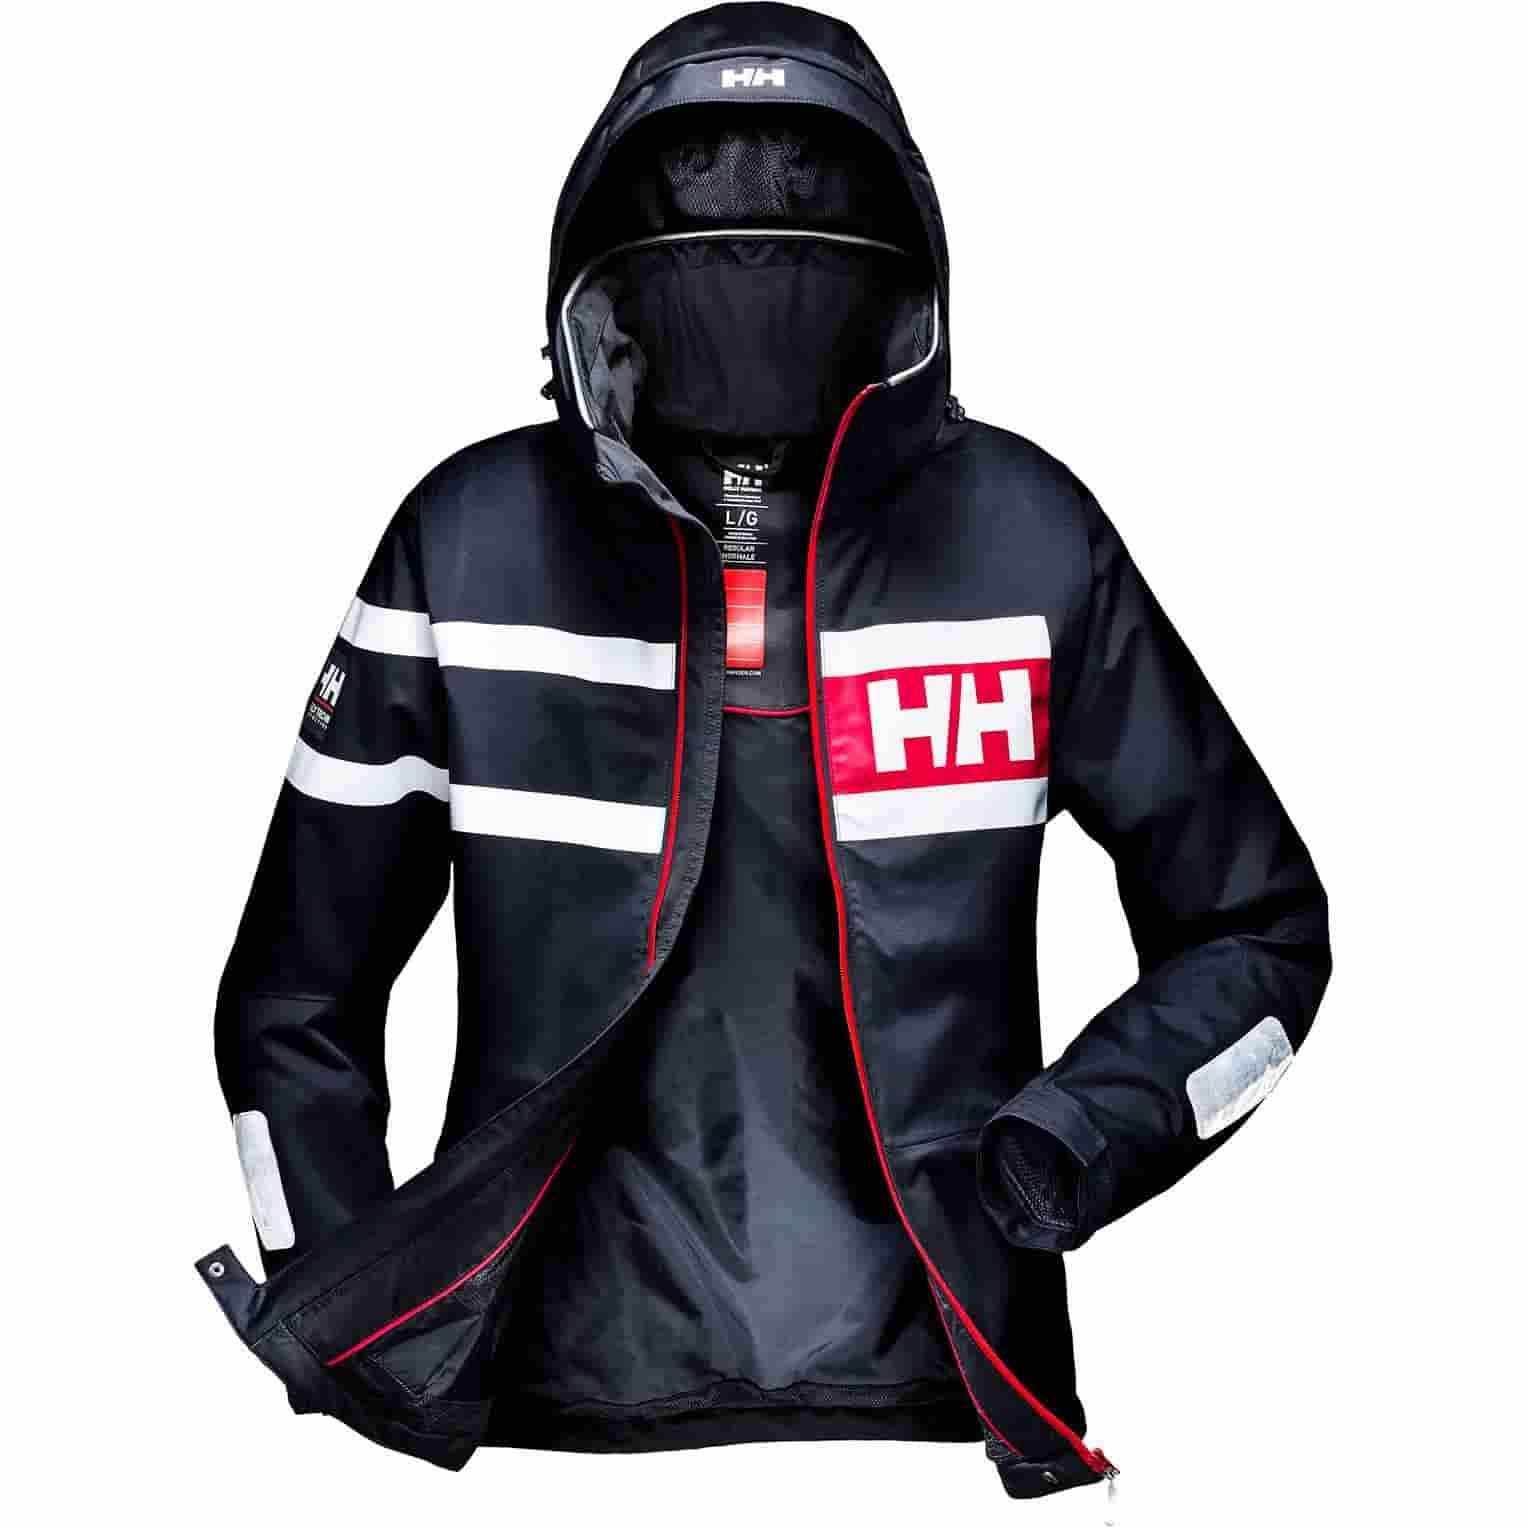 Best Overall Helly Hansen Sailing Jacket